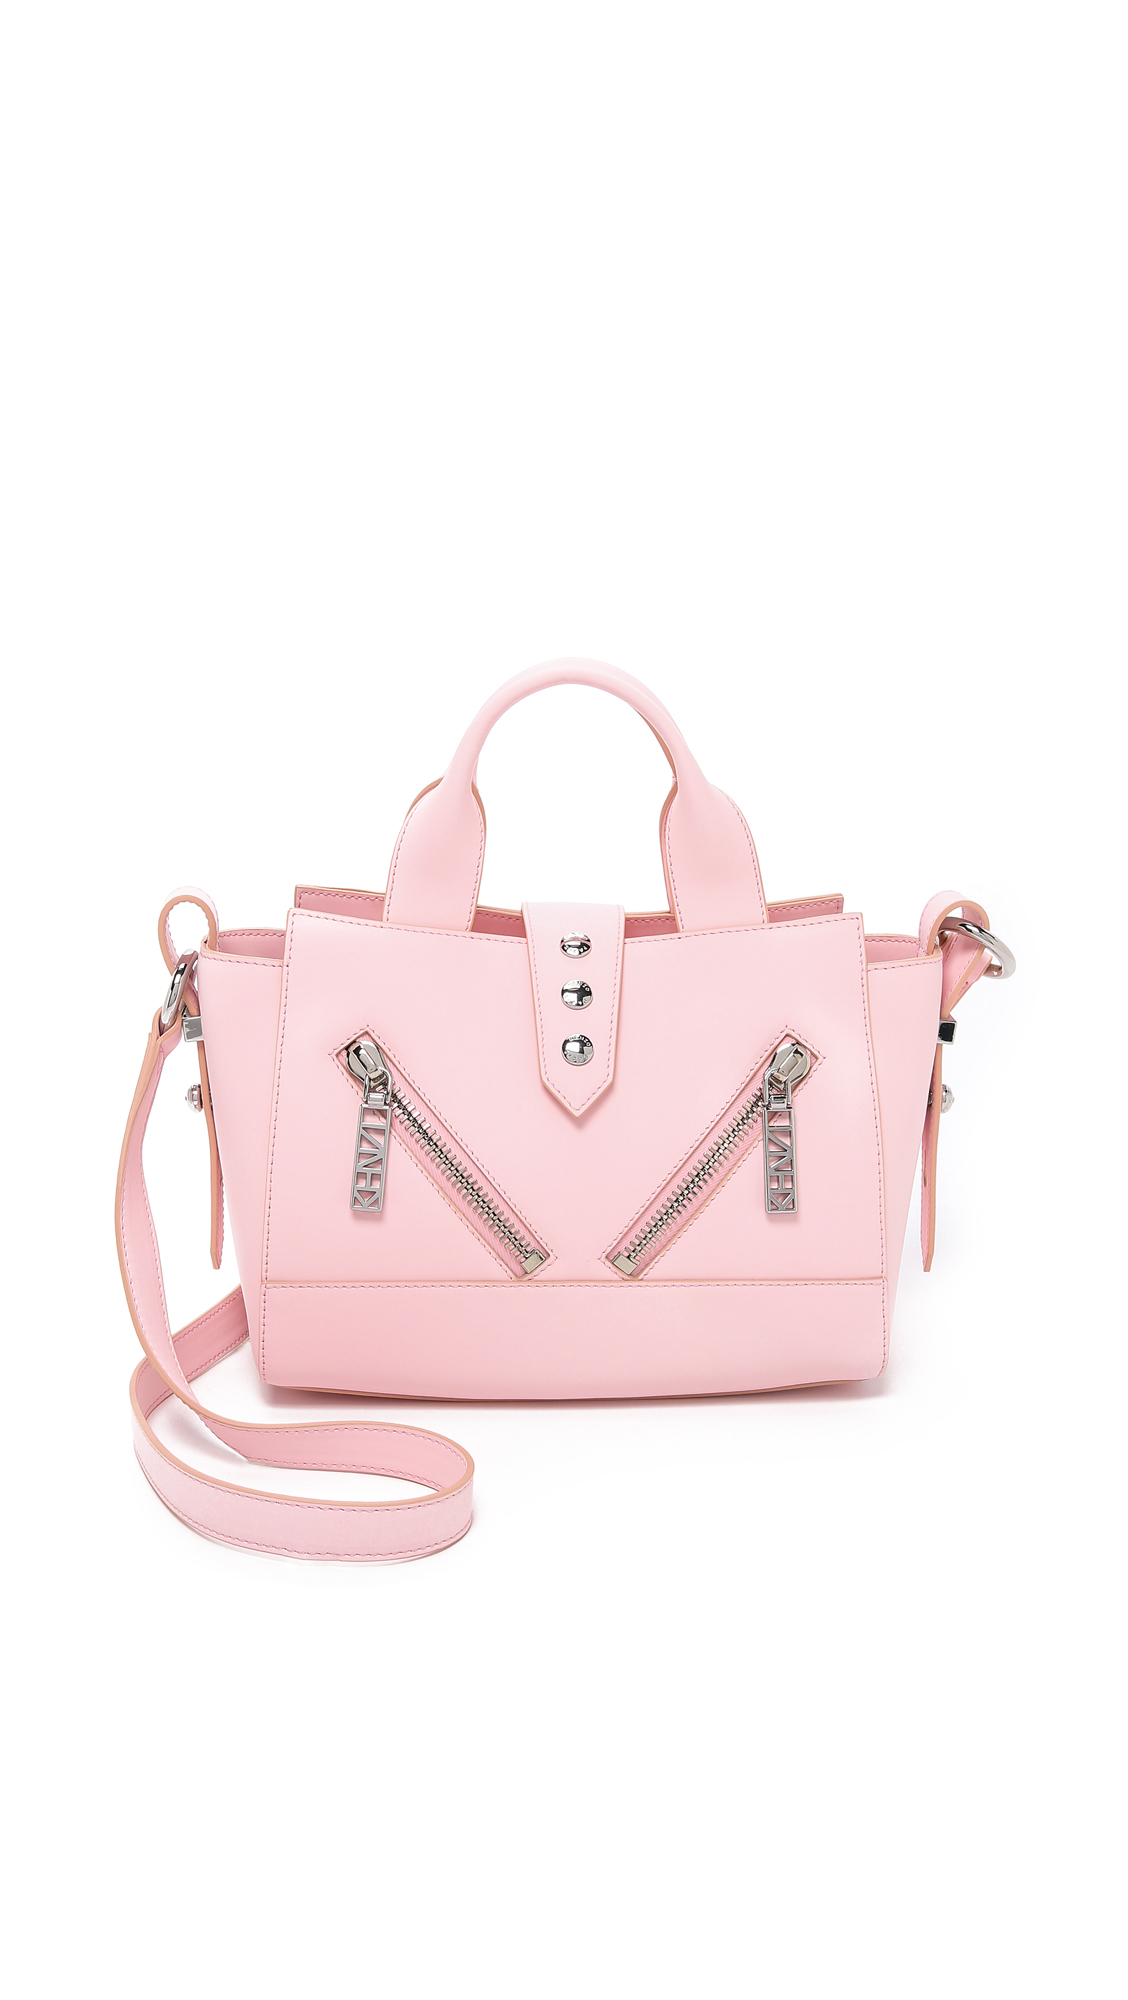 394a35e5f9f KENZO Kalifornia Mini Tote Bag in Pink - Lyst